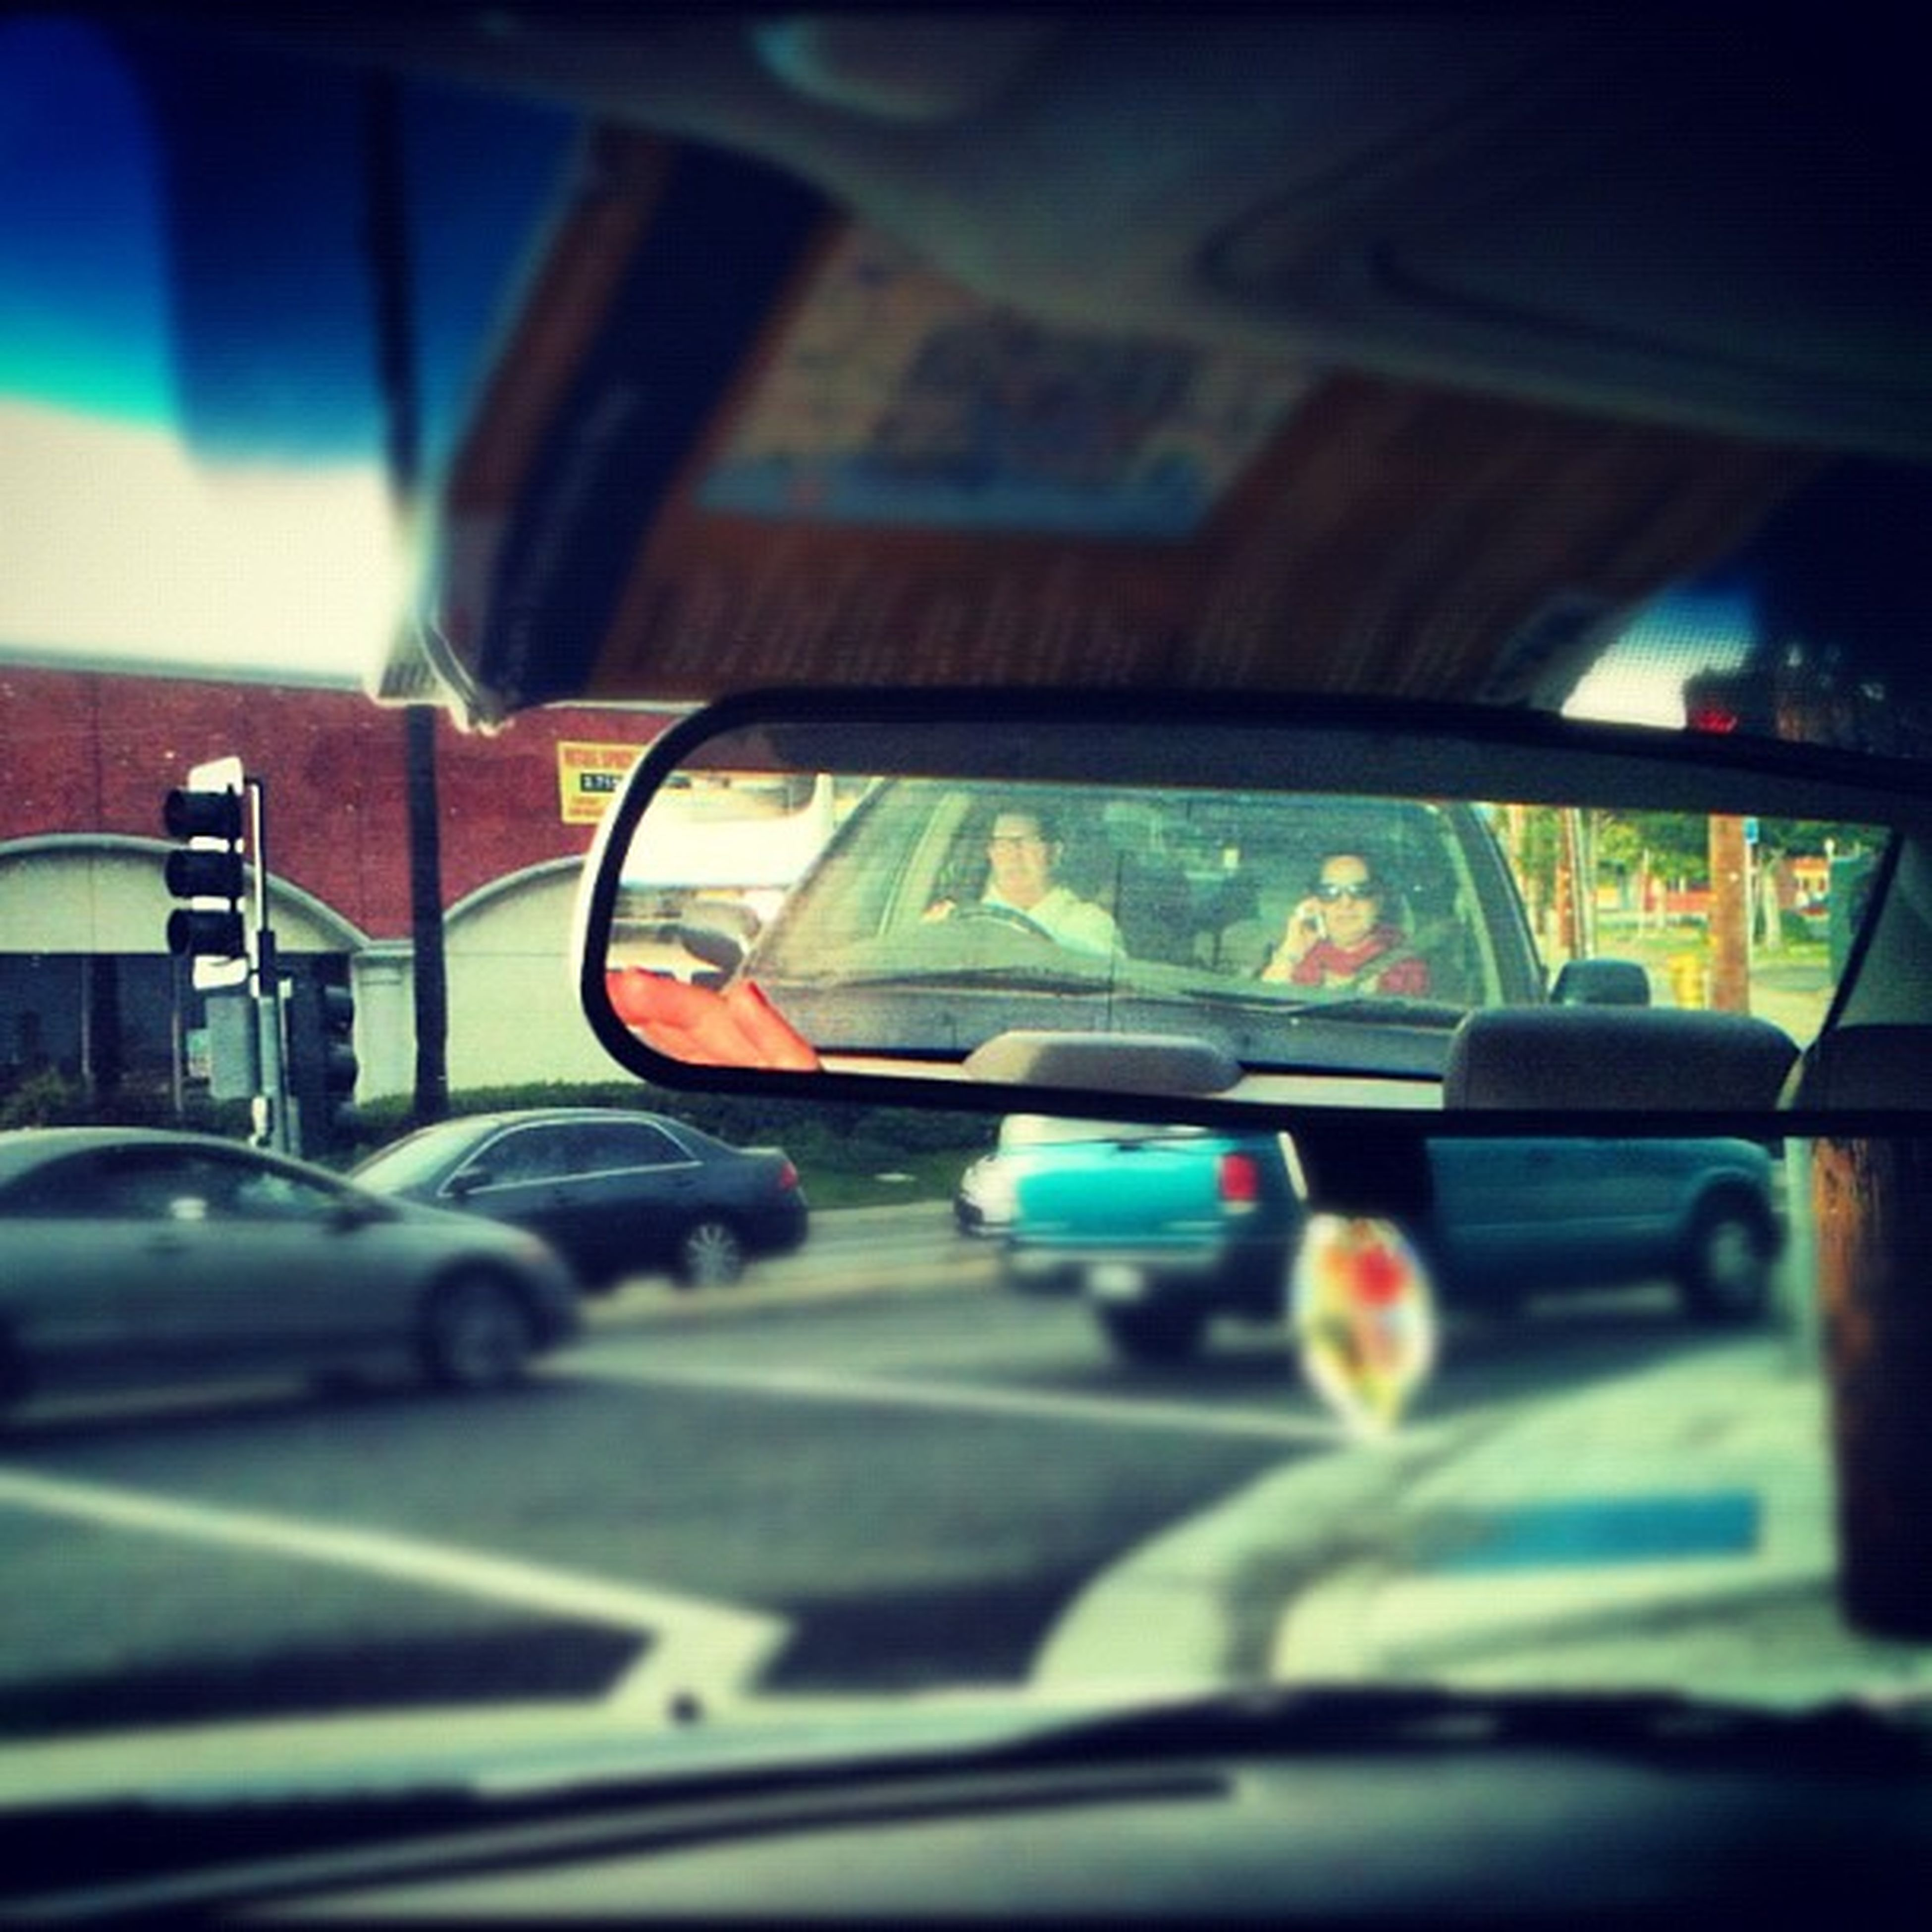 transportation, mode of transport, land vehicle, car, travel, vehicle interior, on the move, public transportation, vehicle seat, selective focus, blurred motion, journey, car interior, road, bus, train - vehicle, windshield, passenger train, street